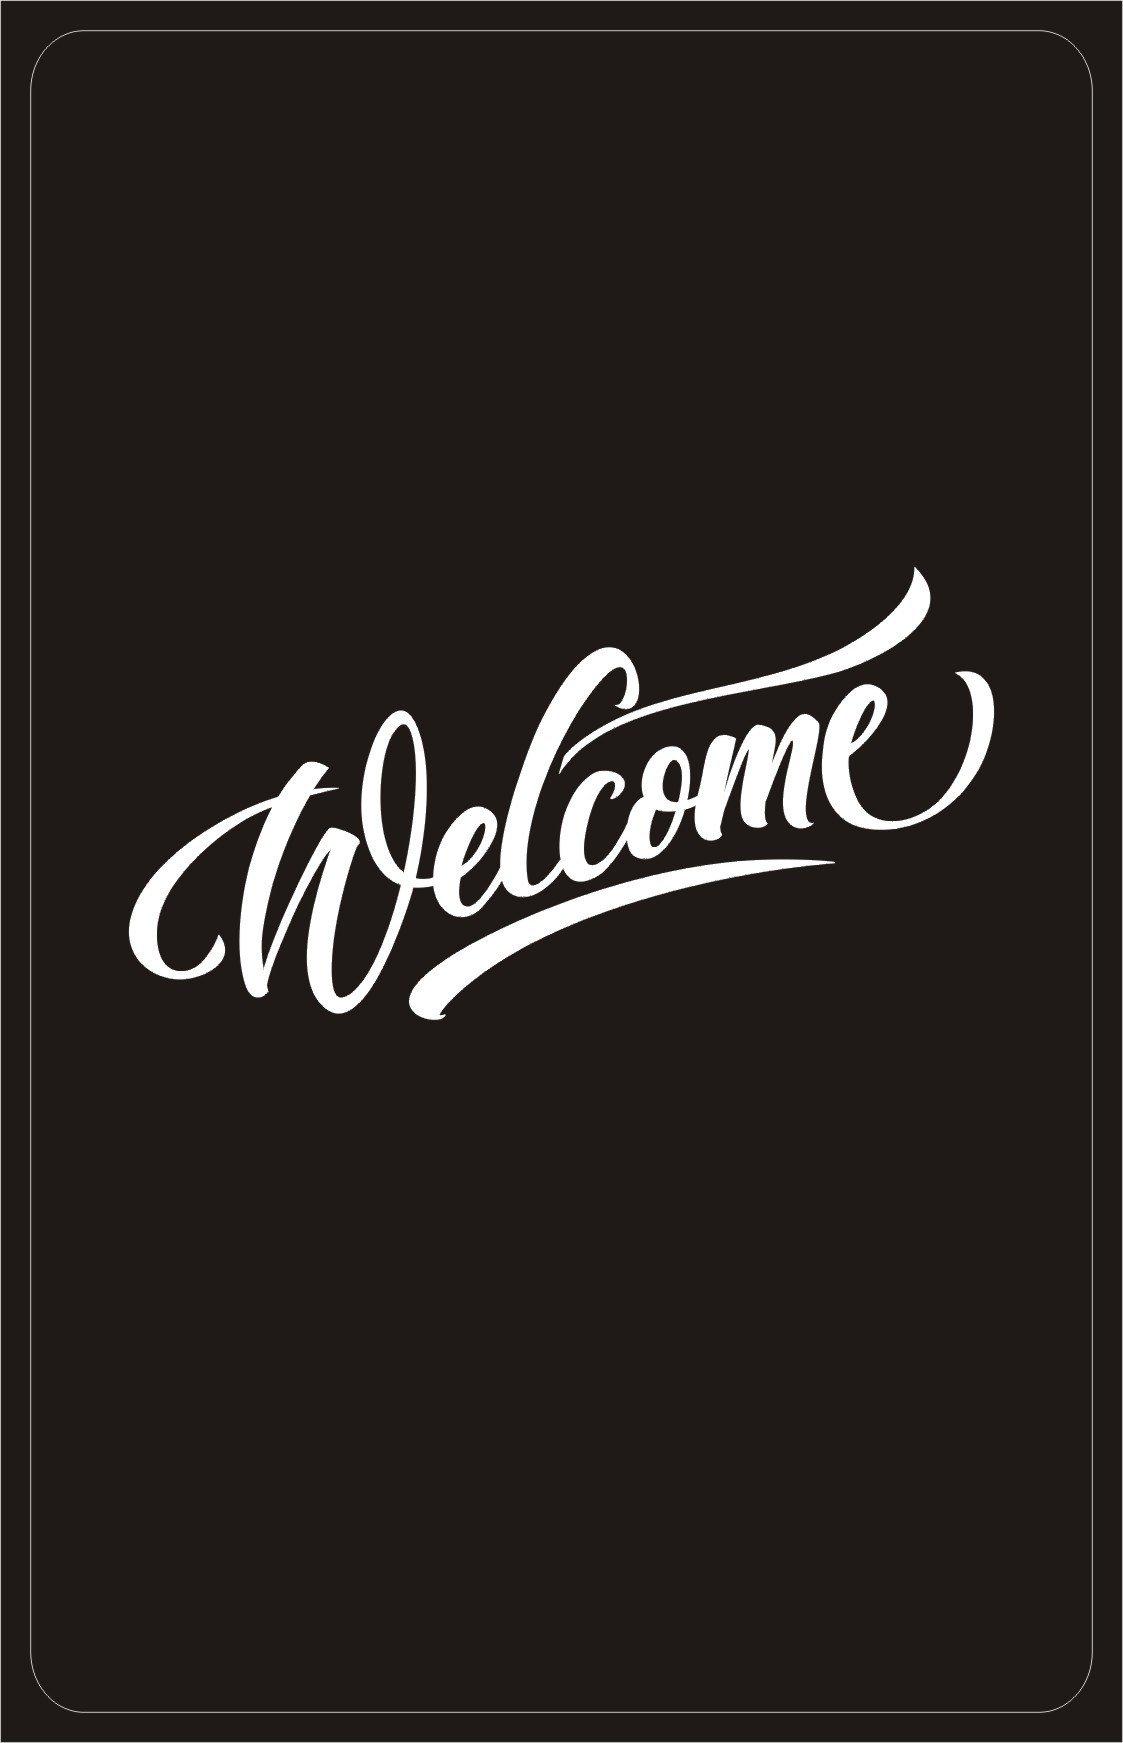 RFID GENERIC PVC CARD 1K 13.56 MHZ RFID key card Black''WELCOME''